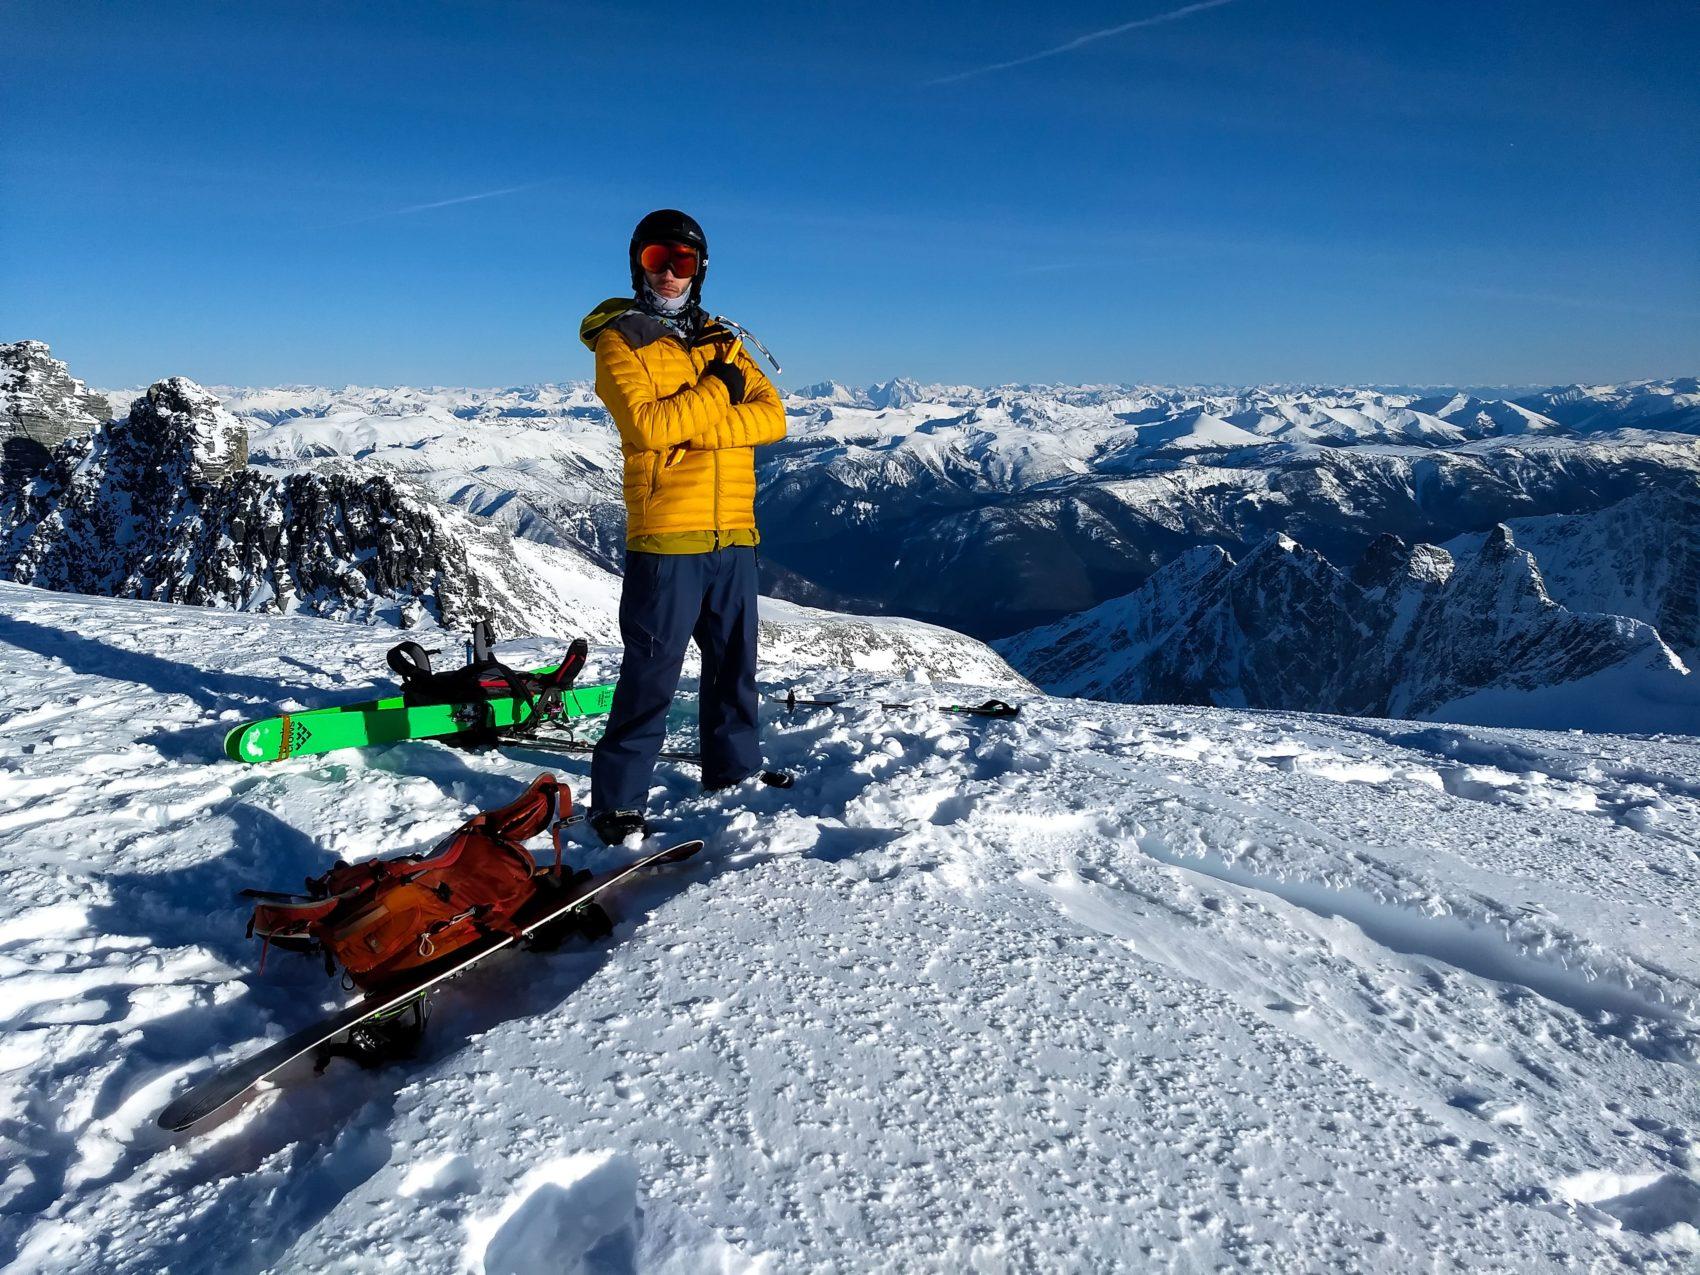 splitboarder at the summit of rogers peak